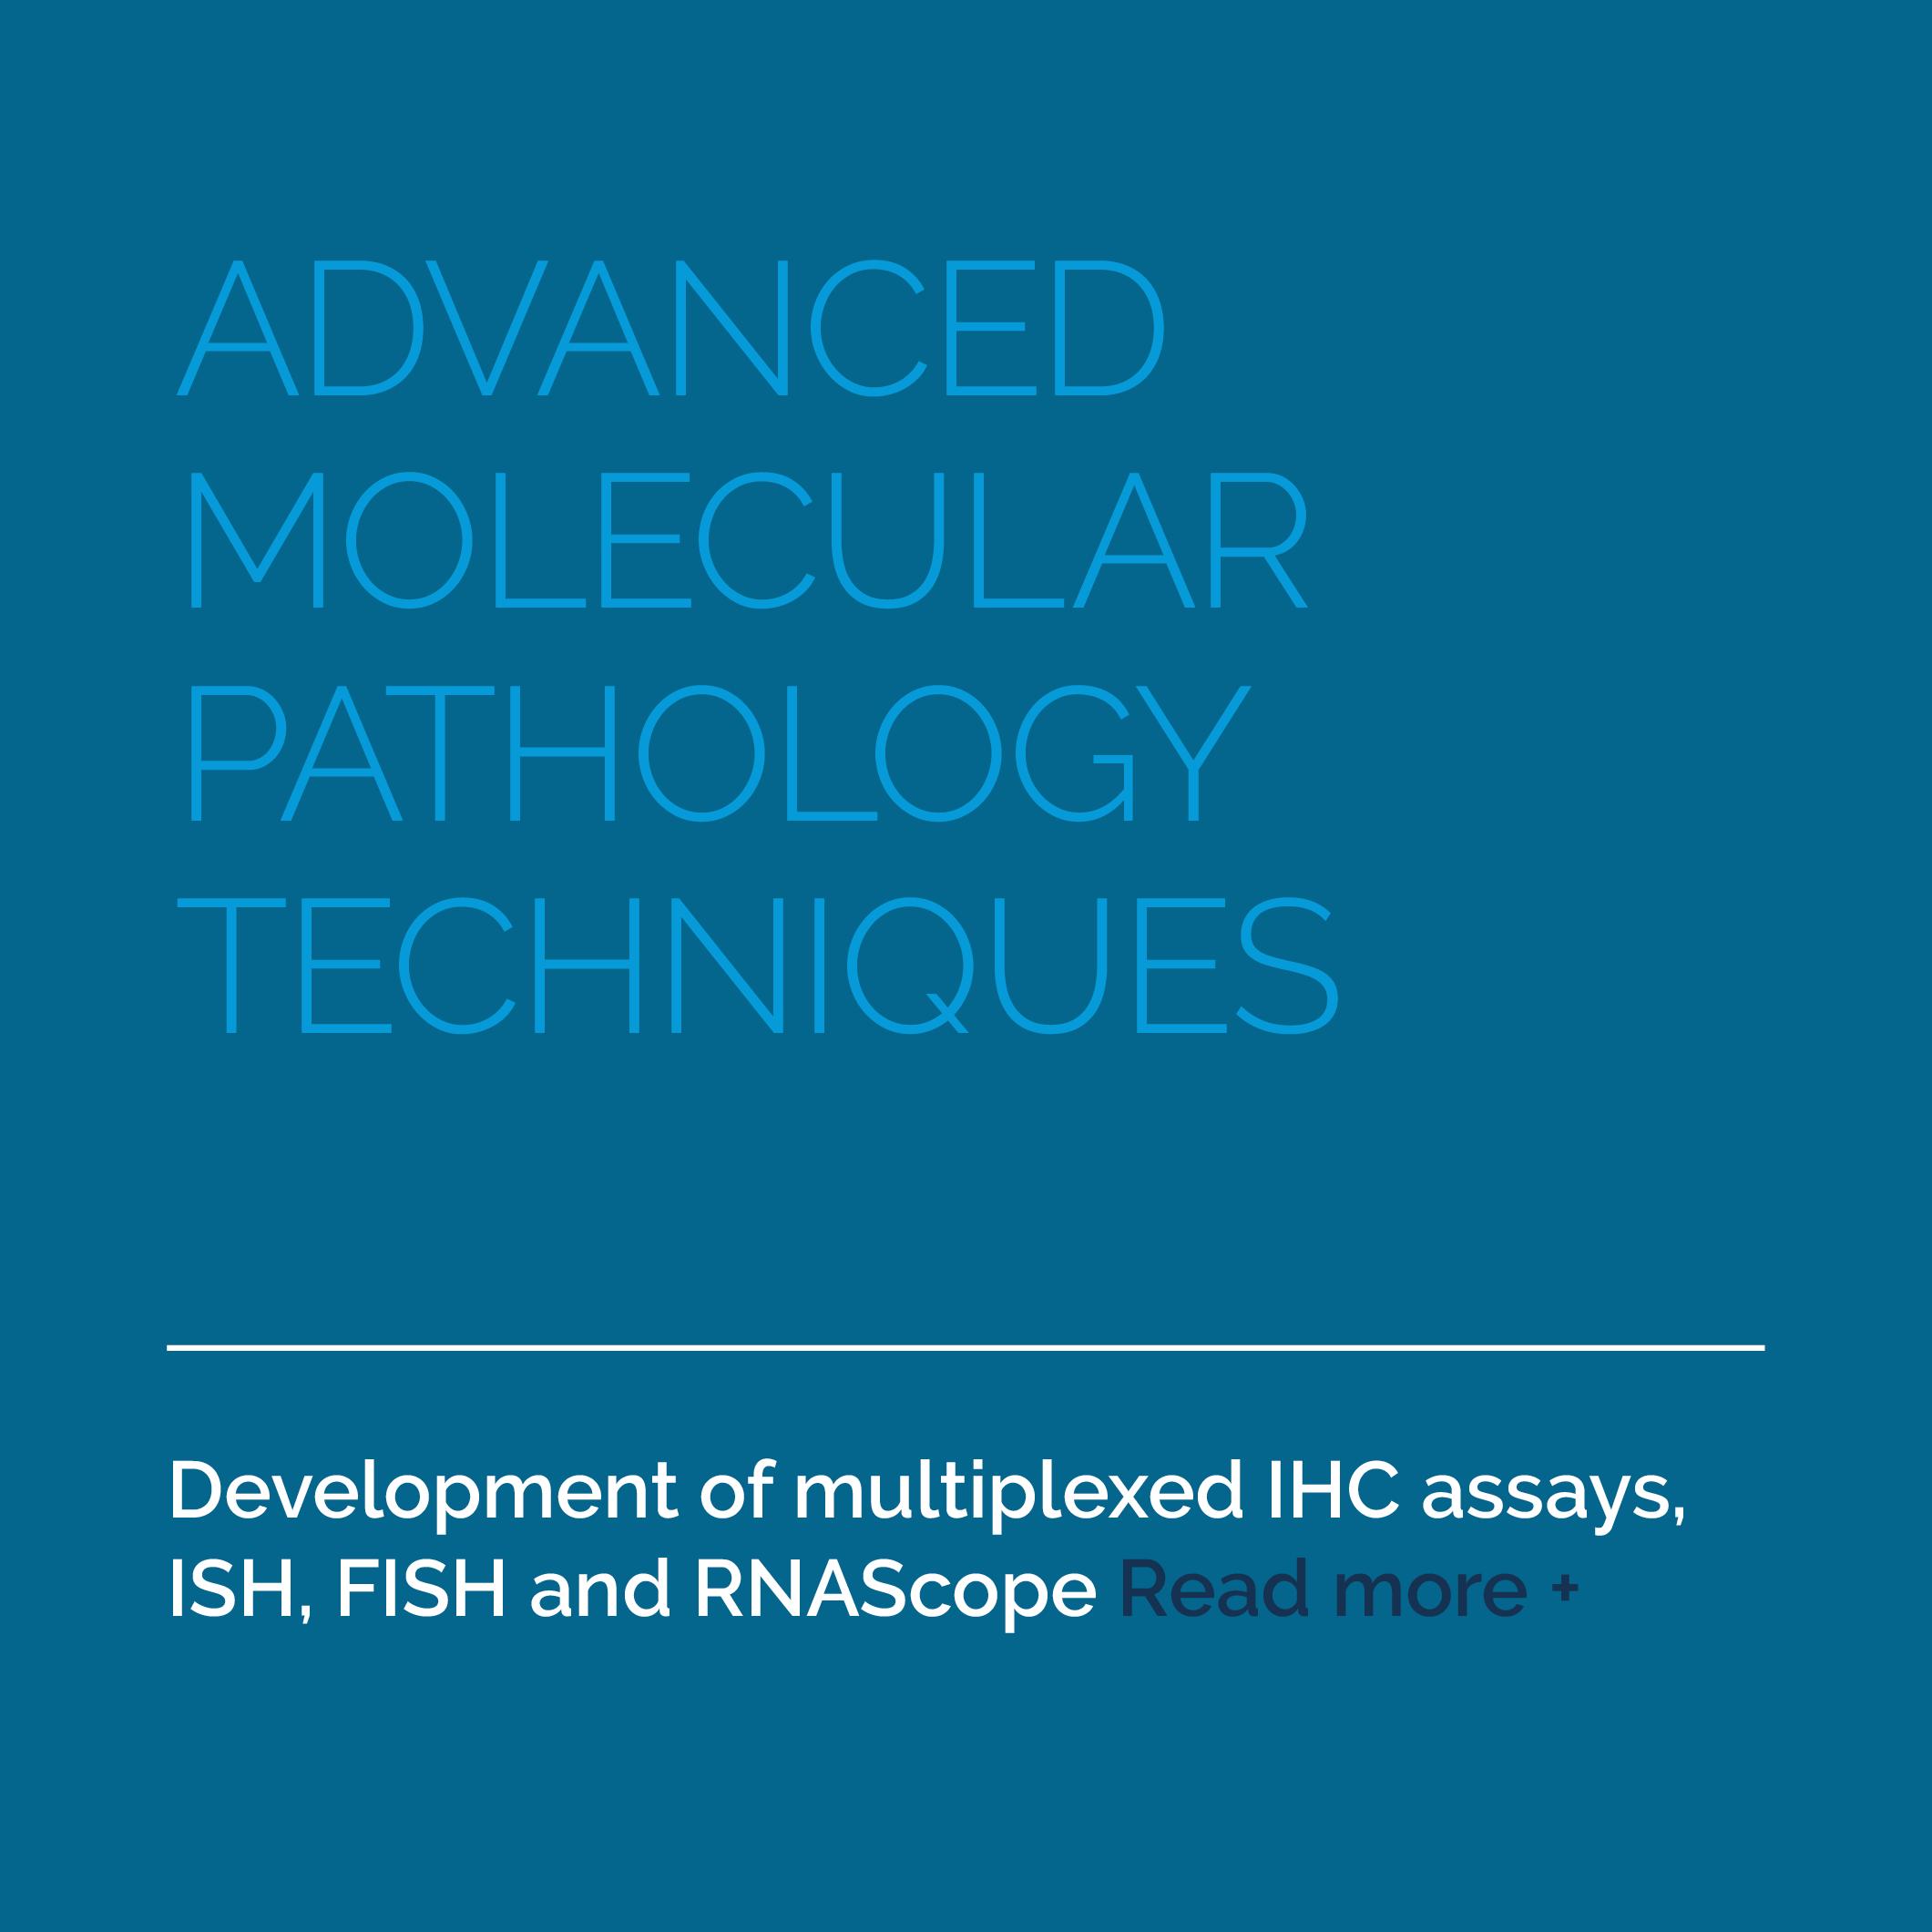 4-Services-Advanced-Molecular-Pathology-techniques-AFTER.png